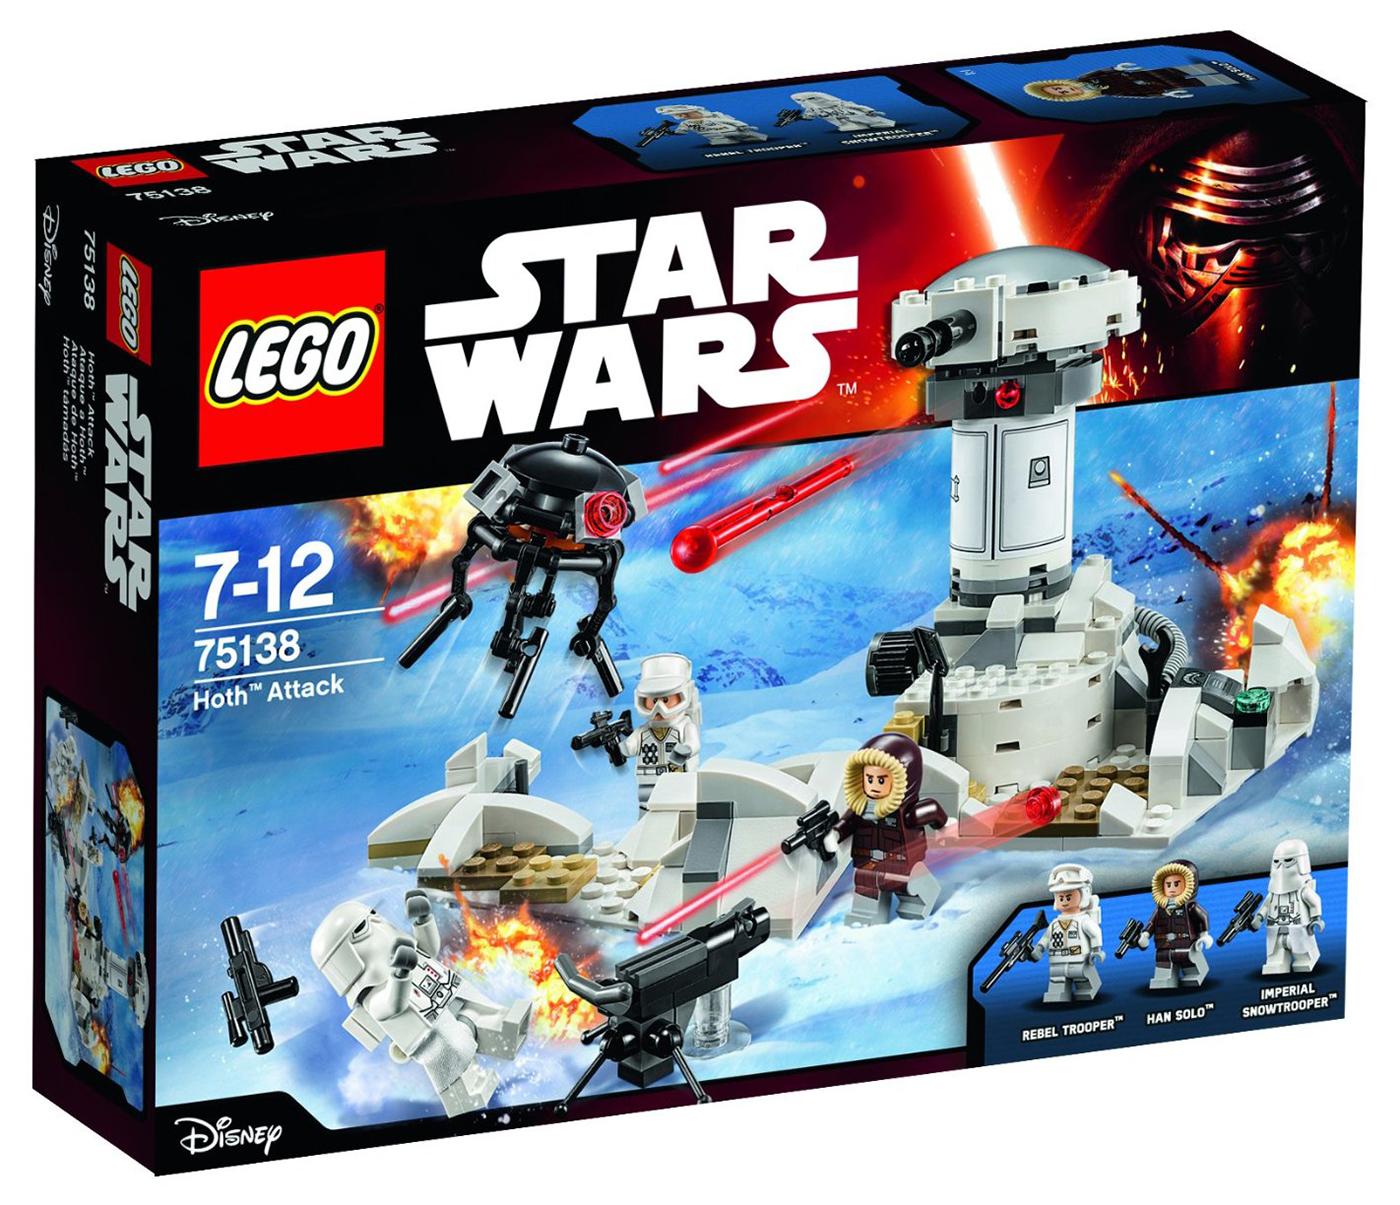 lego star wars 75138 pas cher l 39 attaque de hoth. Black Bedroom Furniture Sets. Home Design Ideas